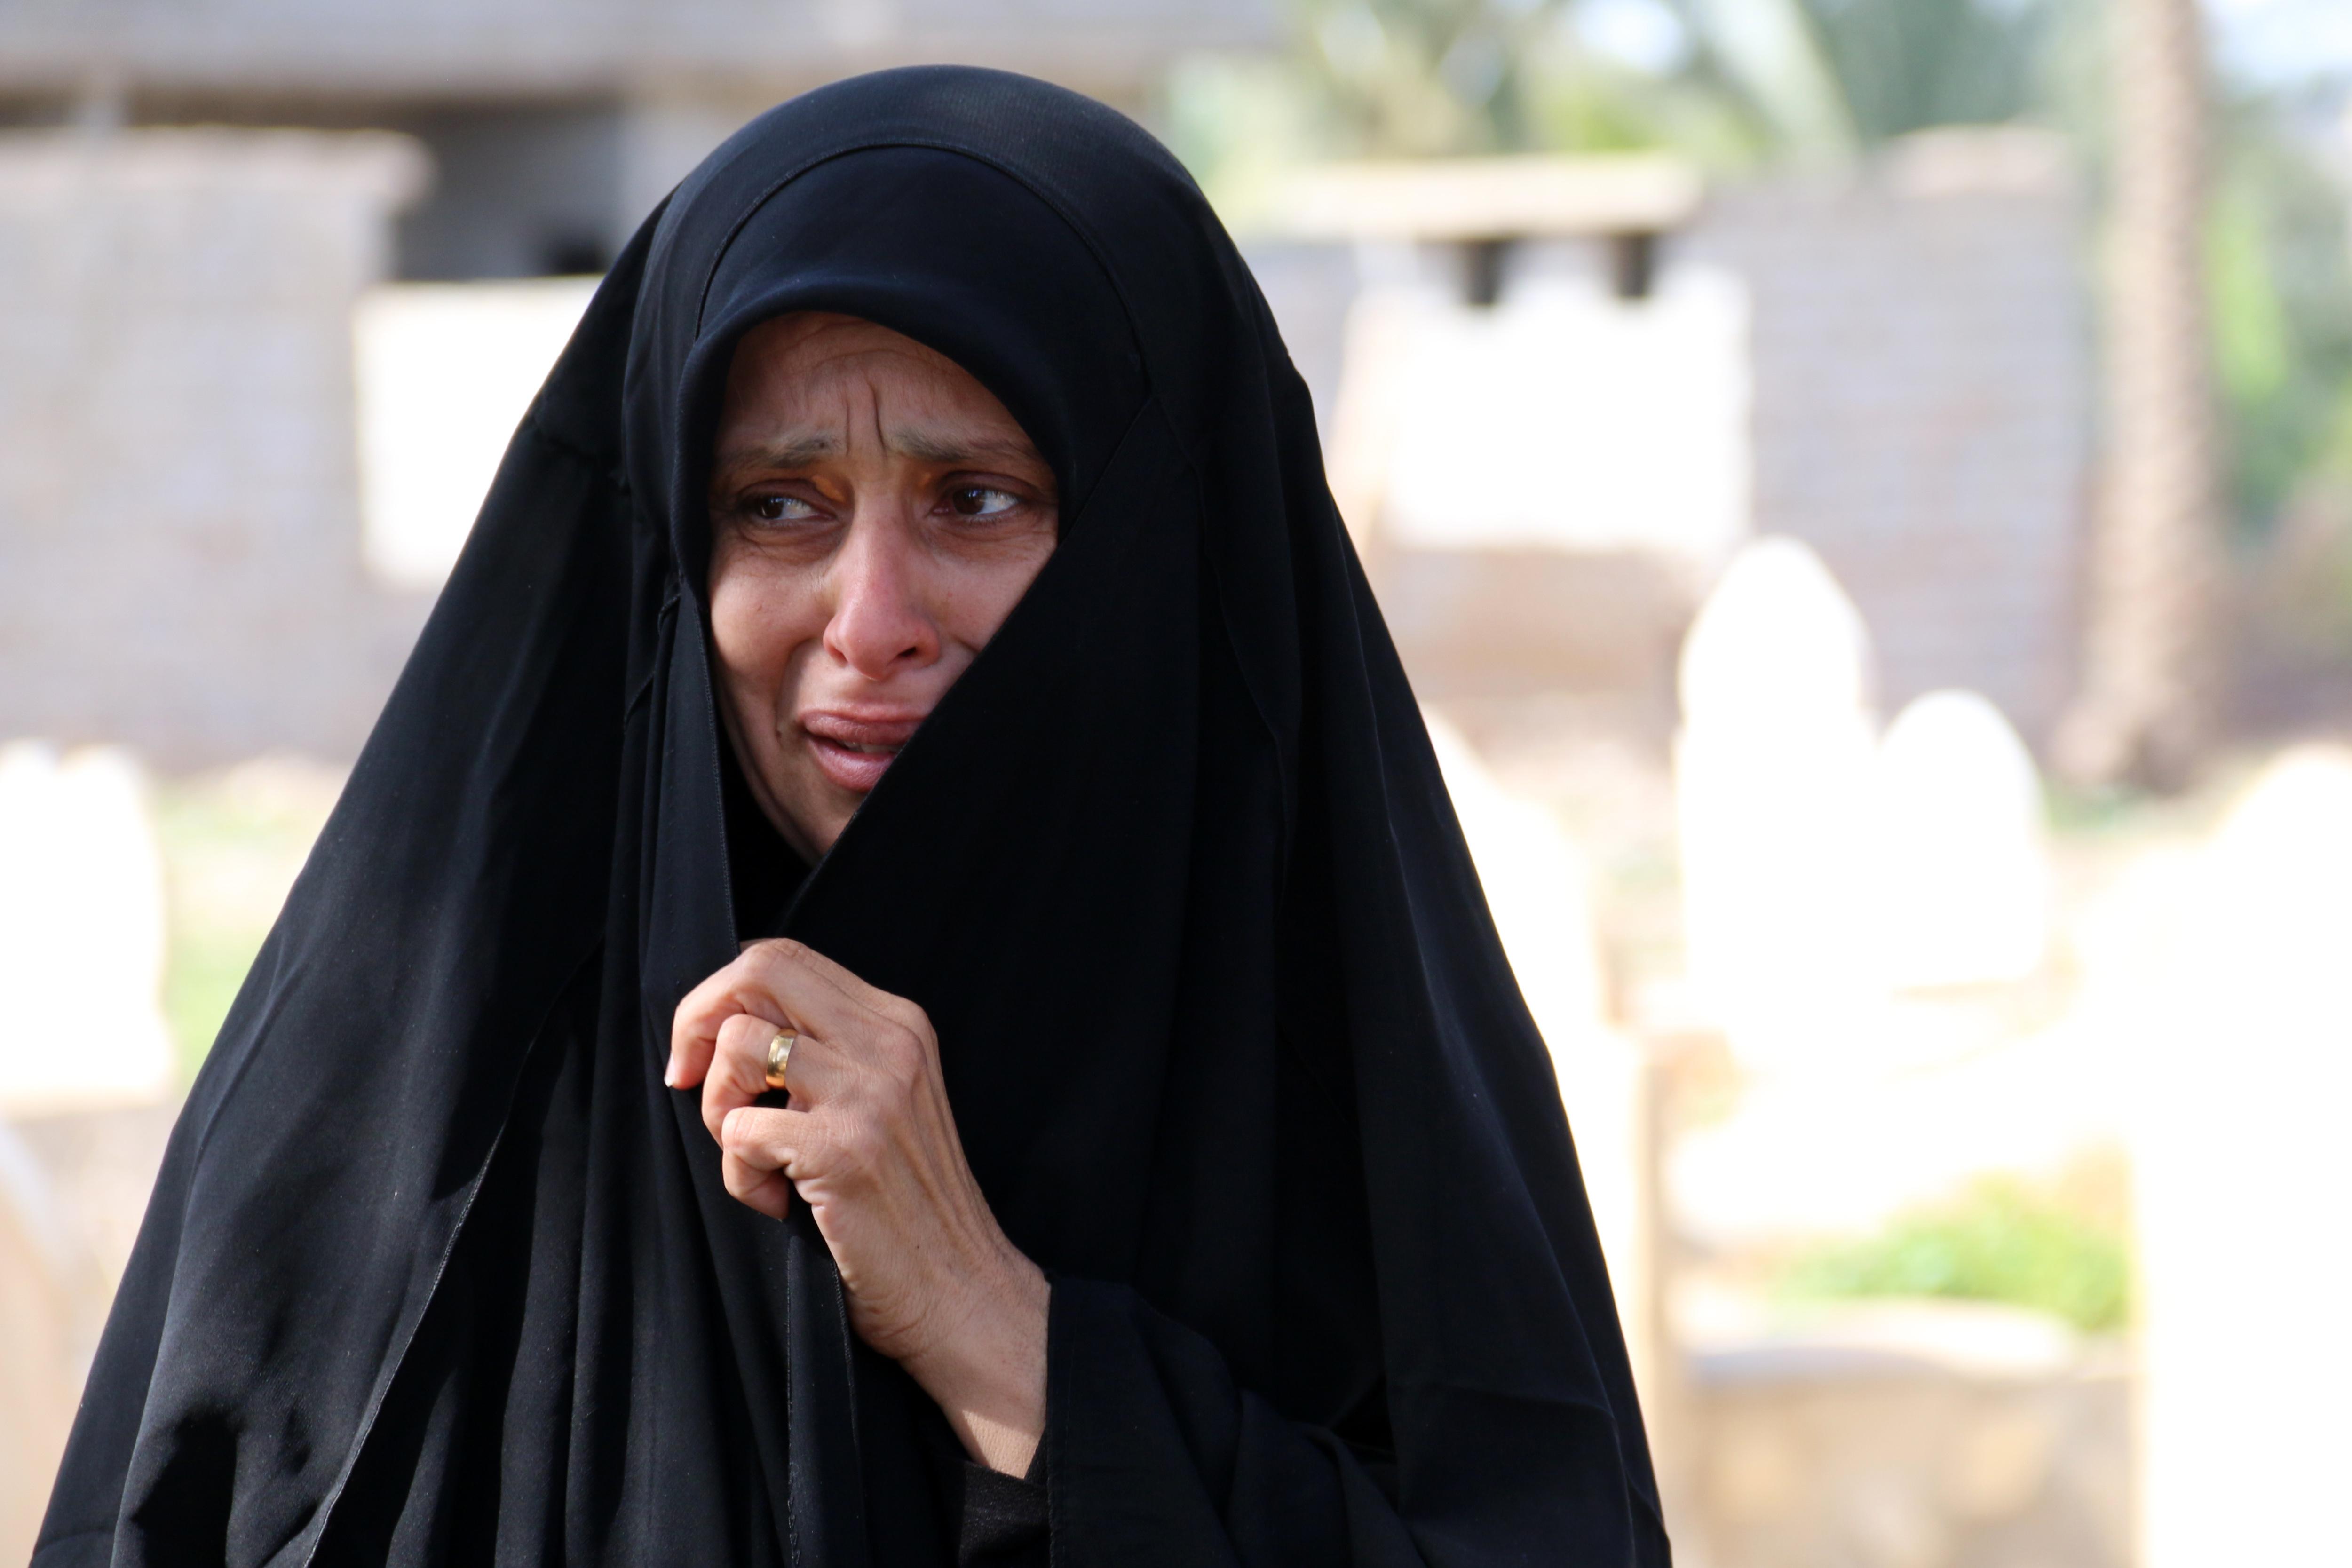 An Iraqi woman mourns during the funeral of Fatima Samir.